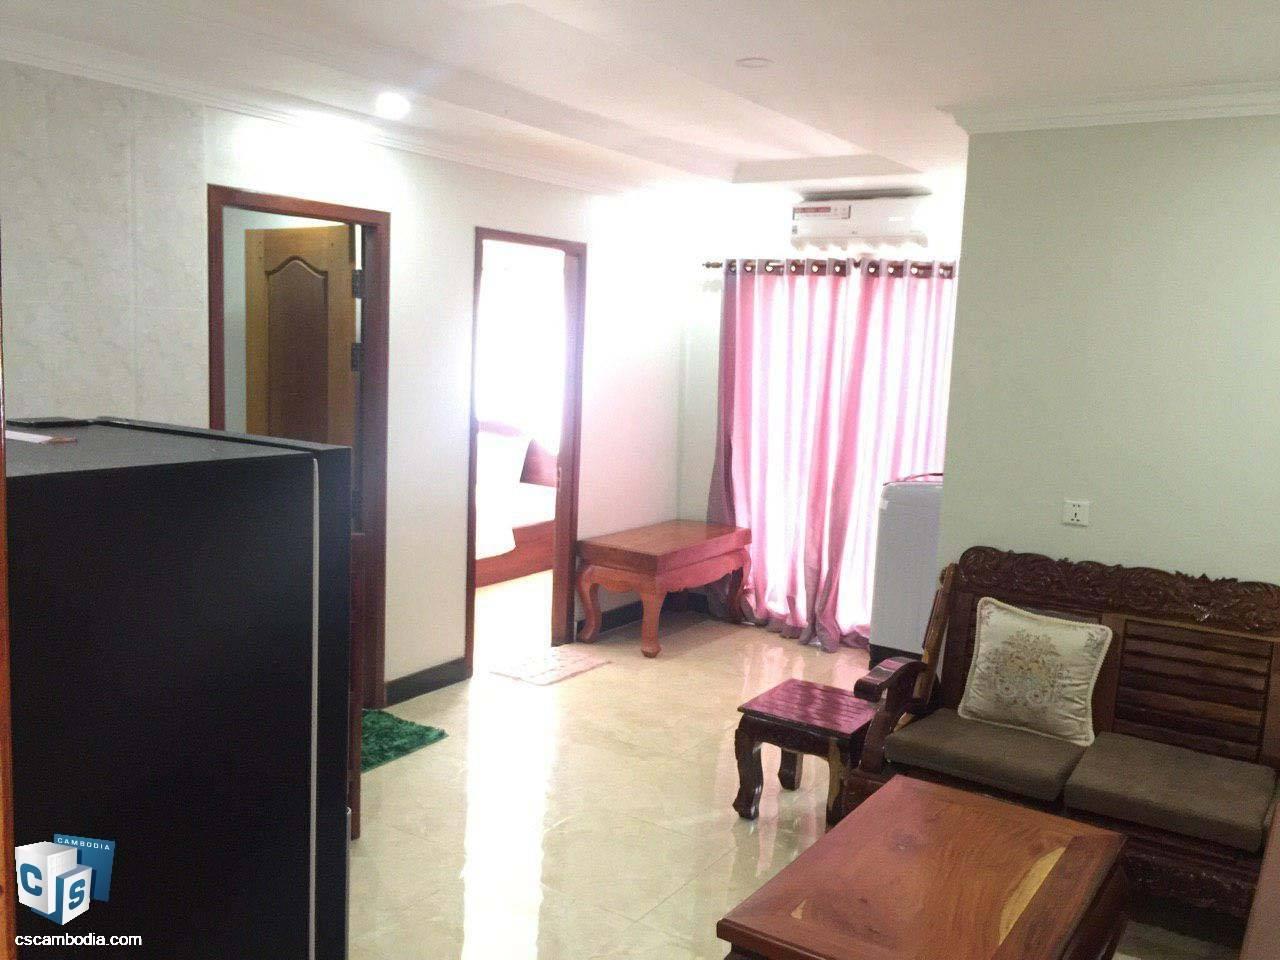 2 Bedroom Apartment – For Rent- Taphul  Village – Svay Dangkom Commune – Siem Reap